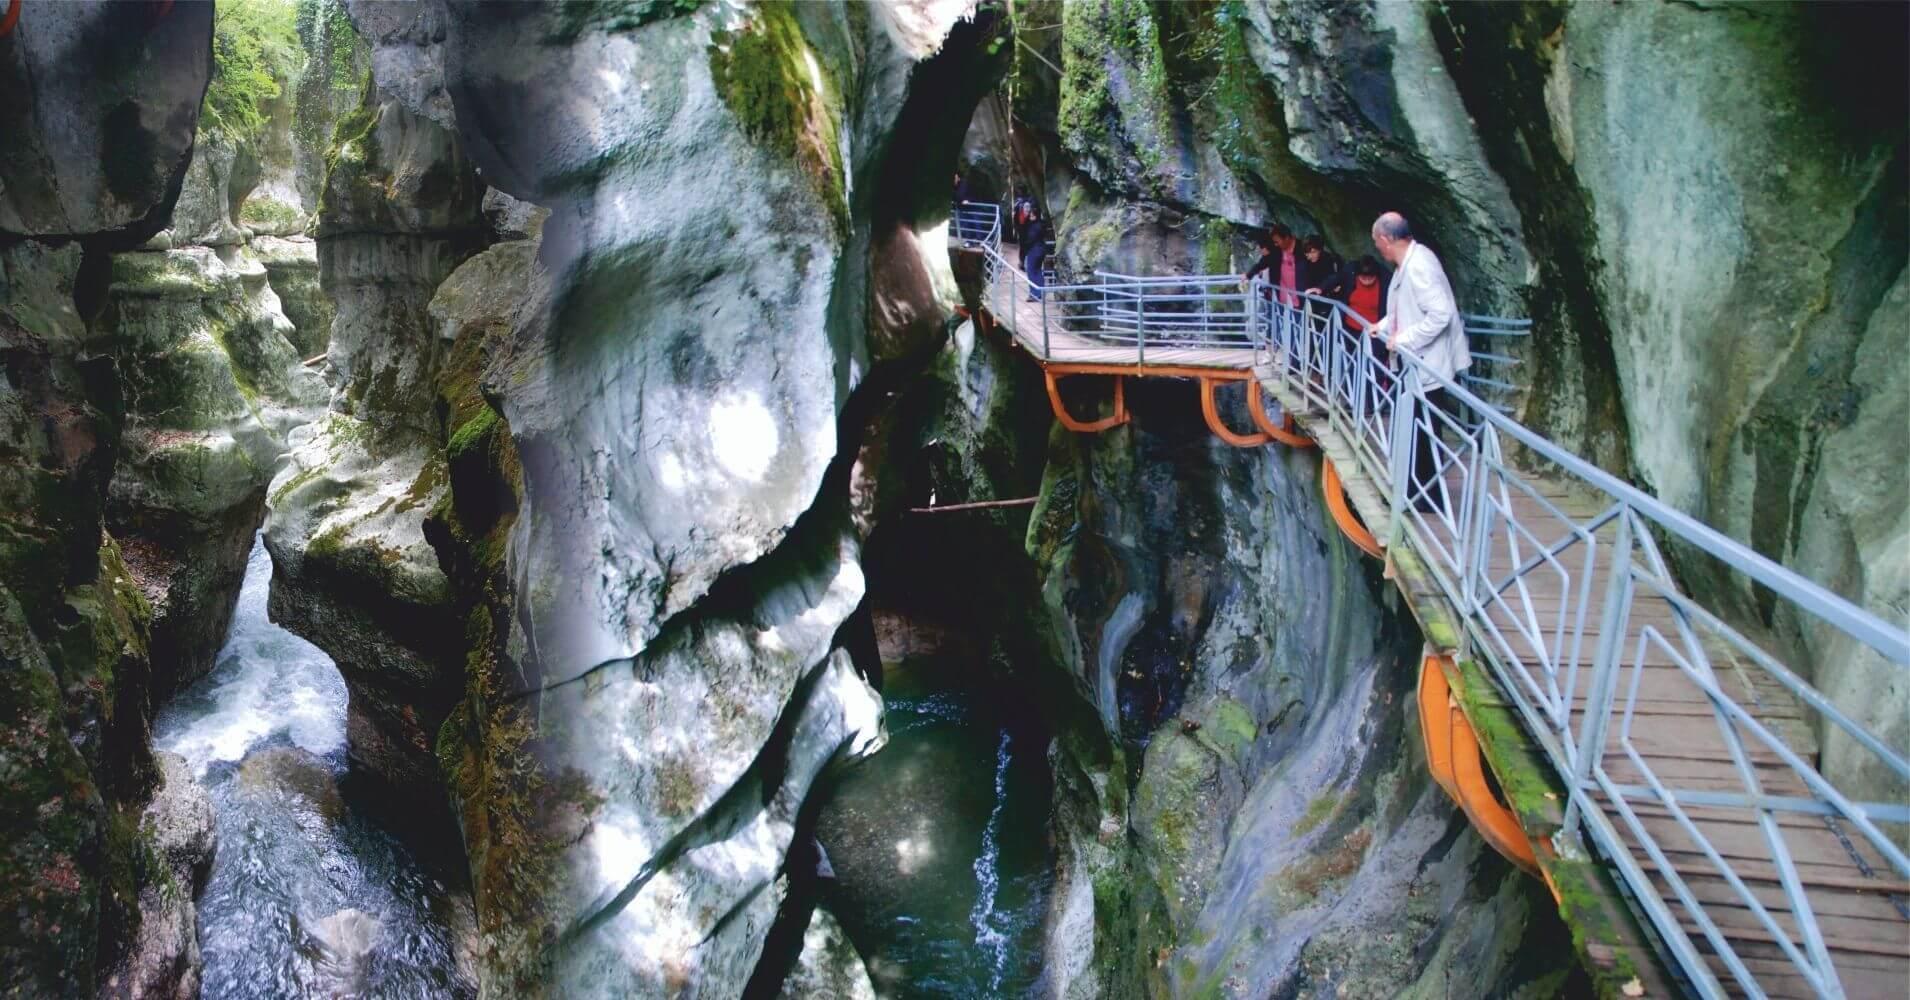 Pasarelas de le Gorges du Fier. Lovagni, Alta Saboya. Auvernia-Ródano-Alpes. Francia.